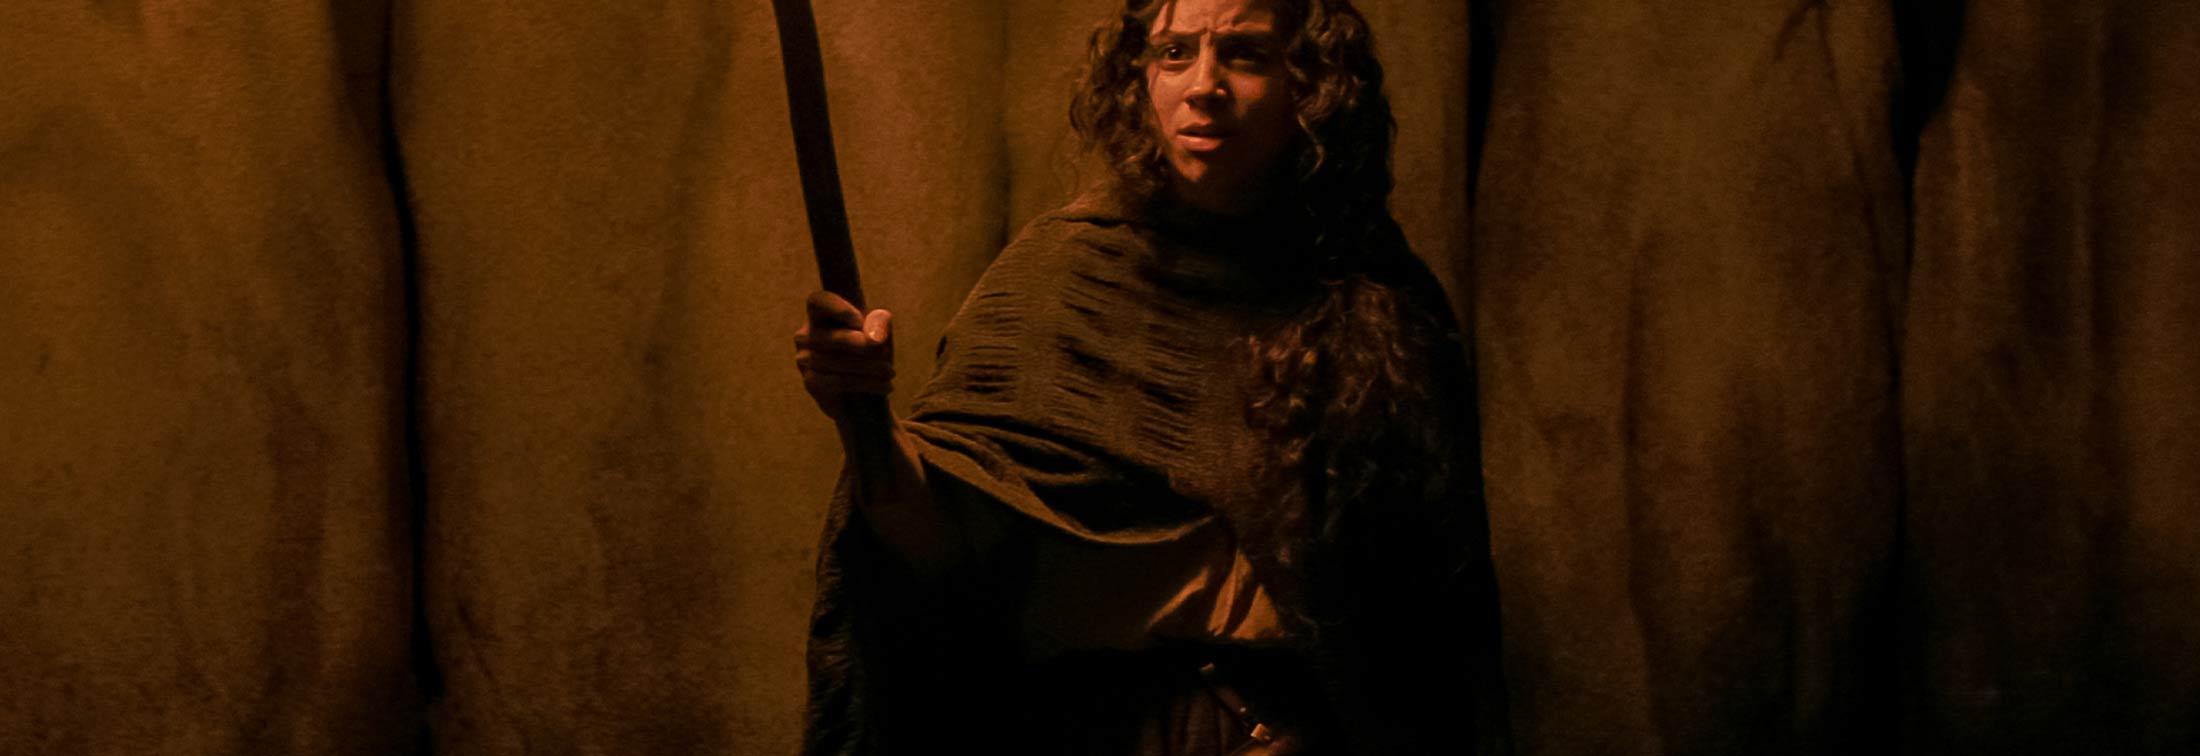 Fear Street Part Three: 1666 - A choppy trilogy reaches its conclusion